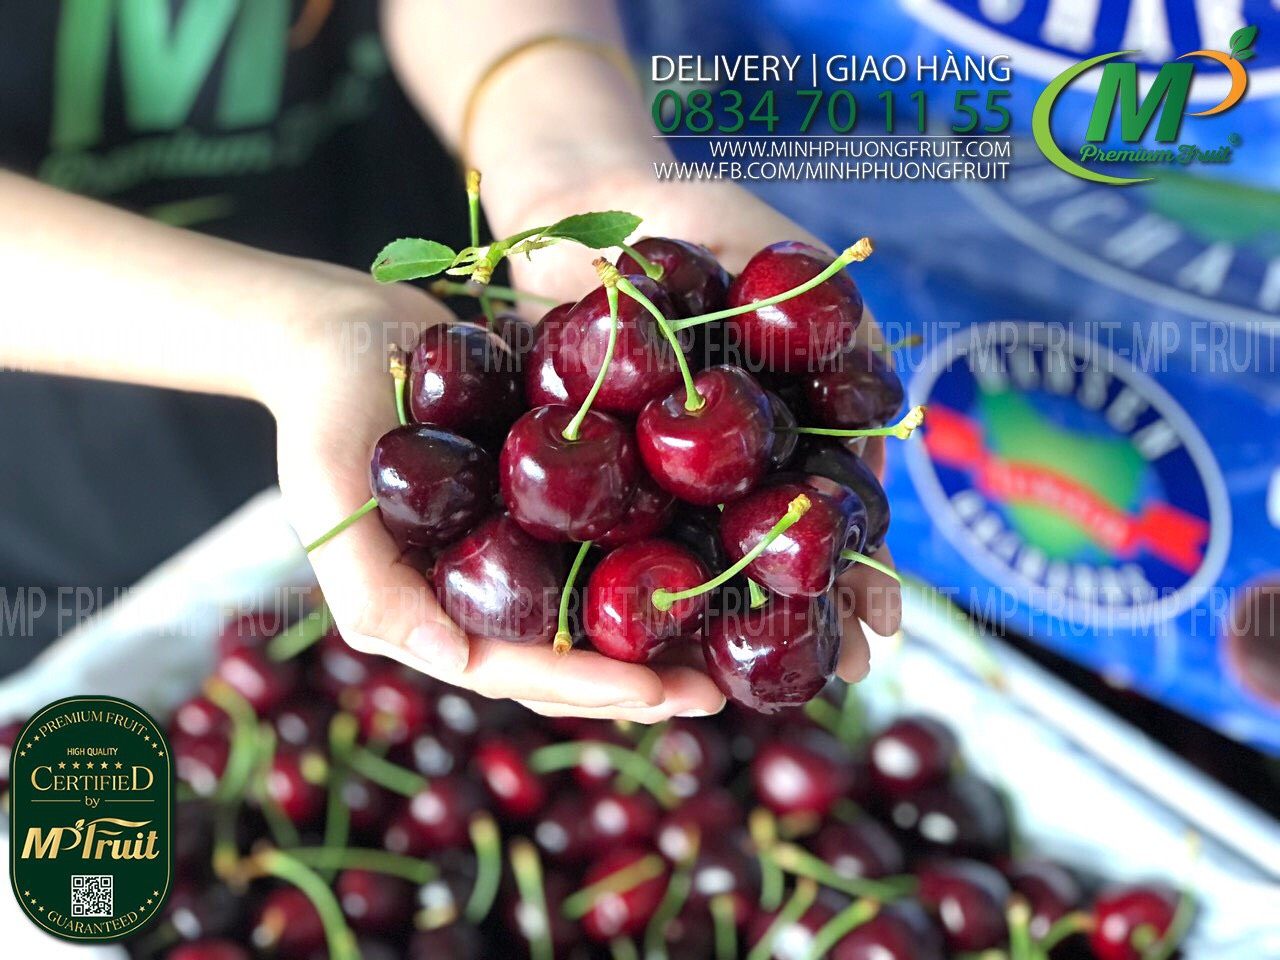 Cherry Úc Tasmania Giống Sentinial Tại MP Fruit